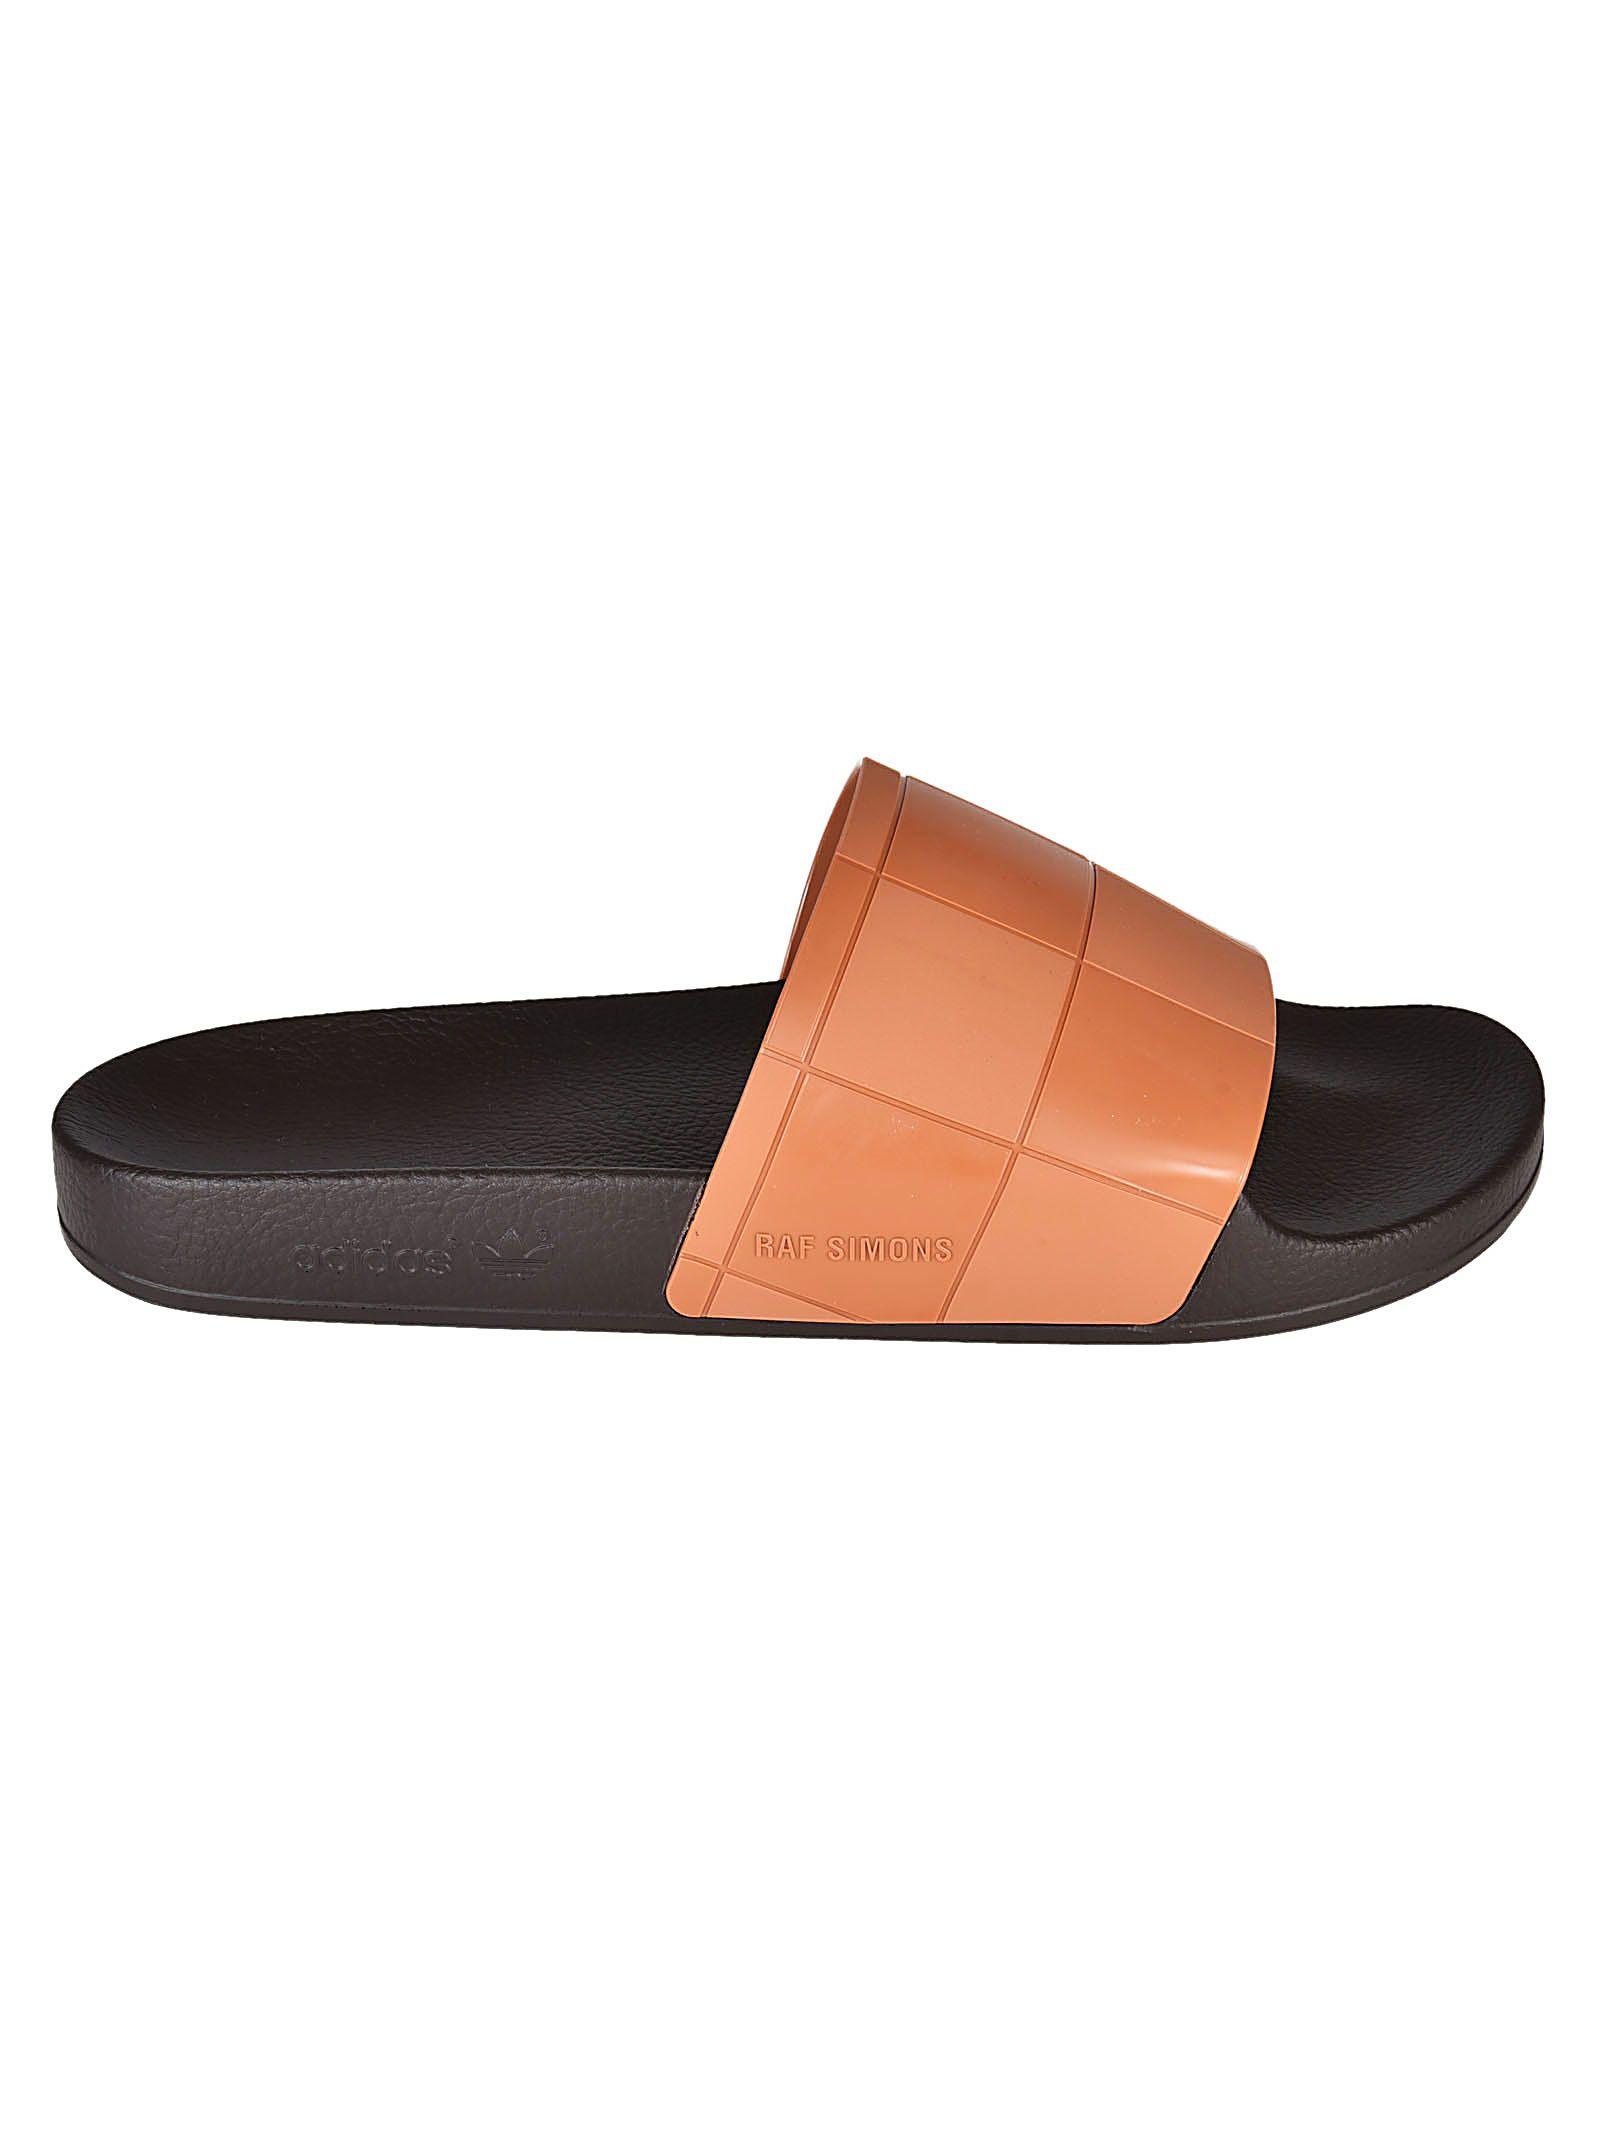 Adidas By Raf Simons Adilette Checkerboard Sliders 10538983